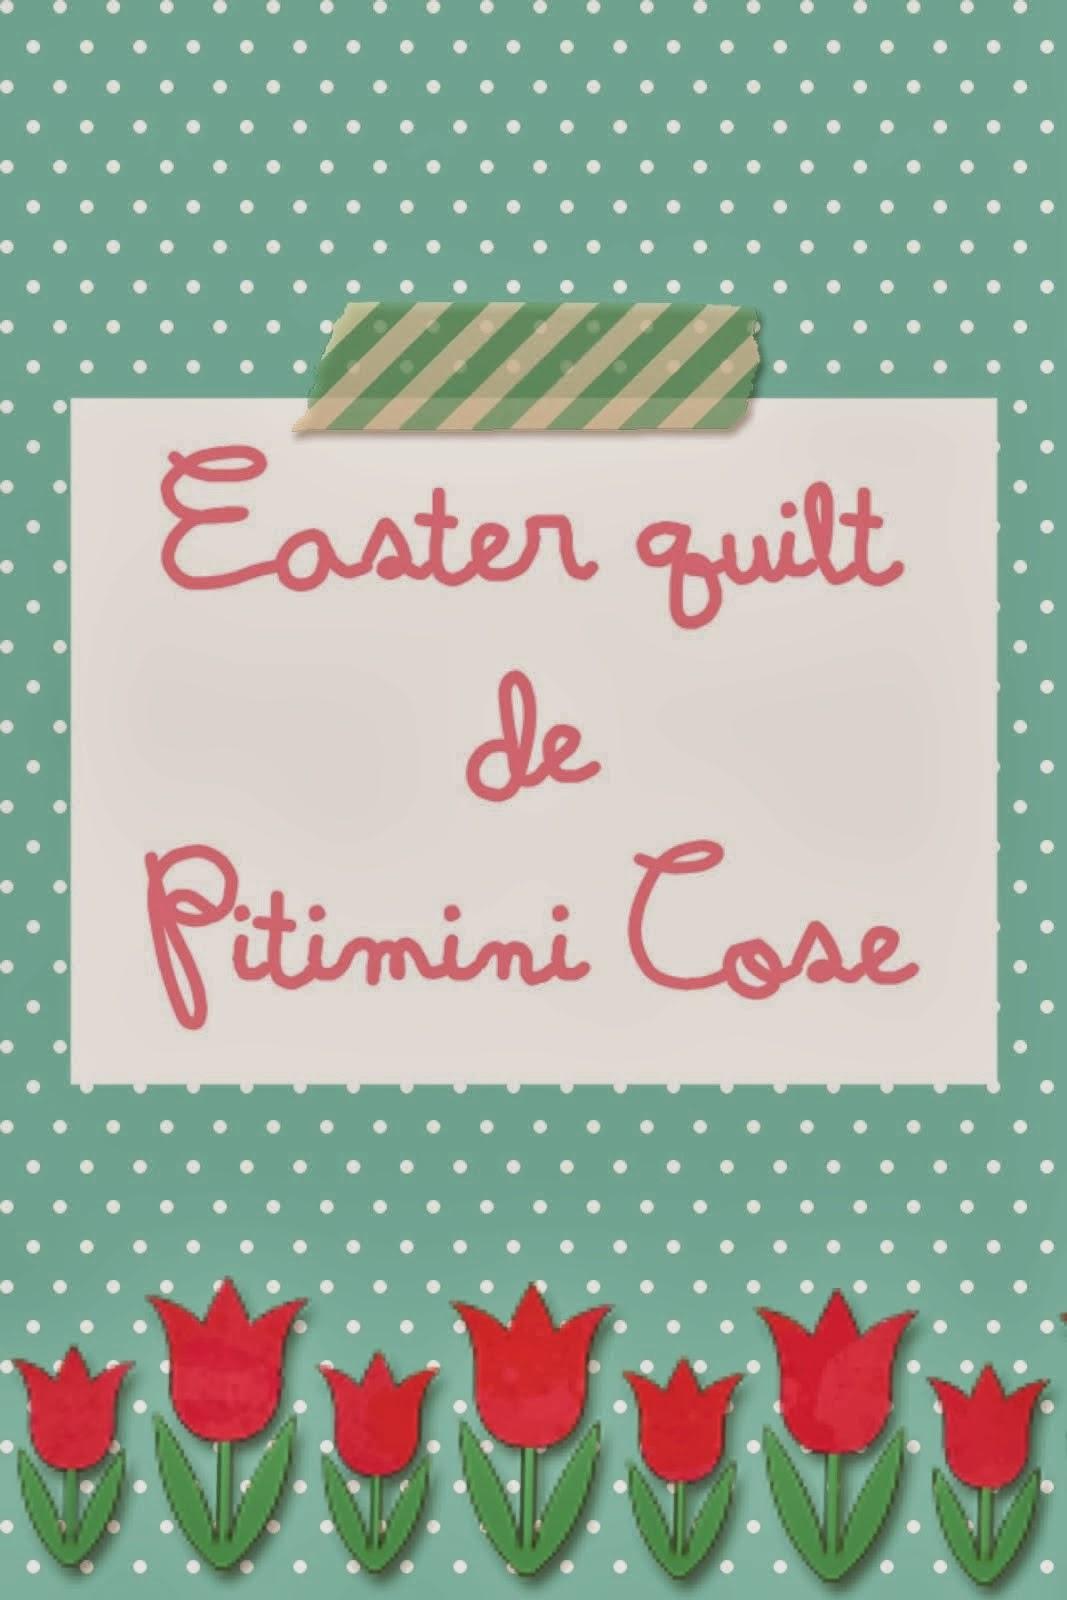 http://pitiminicose.blogspot.com.es/2014/02/juego-sorteo-easter-quilt.html